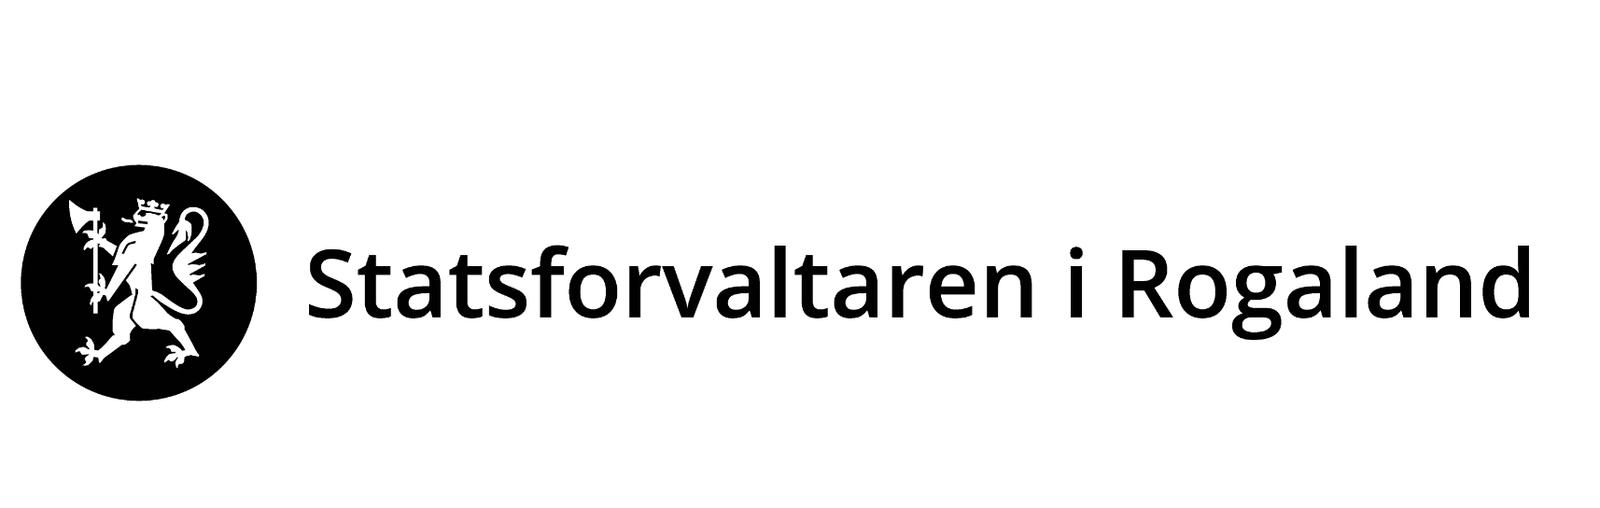 Statsforvaltaren i Rogaland